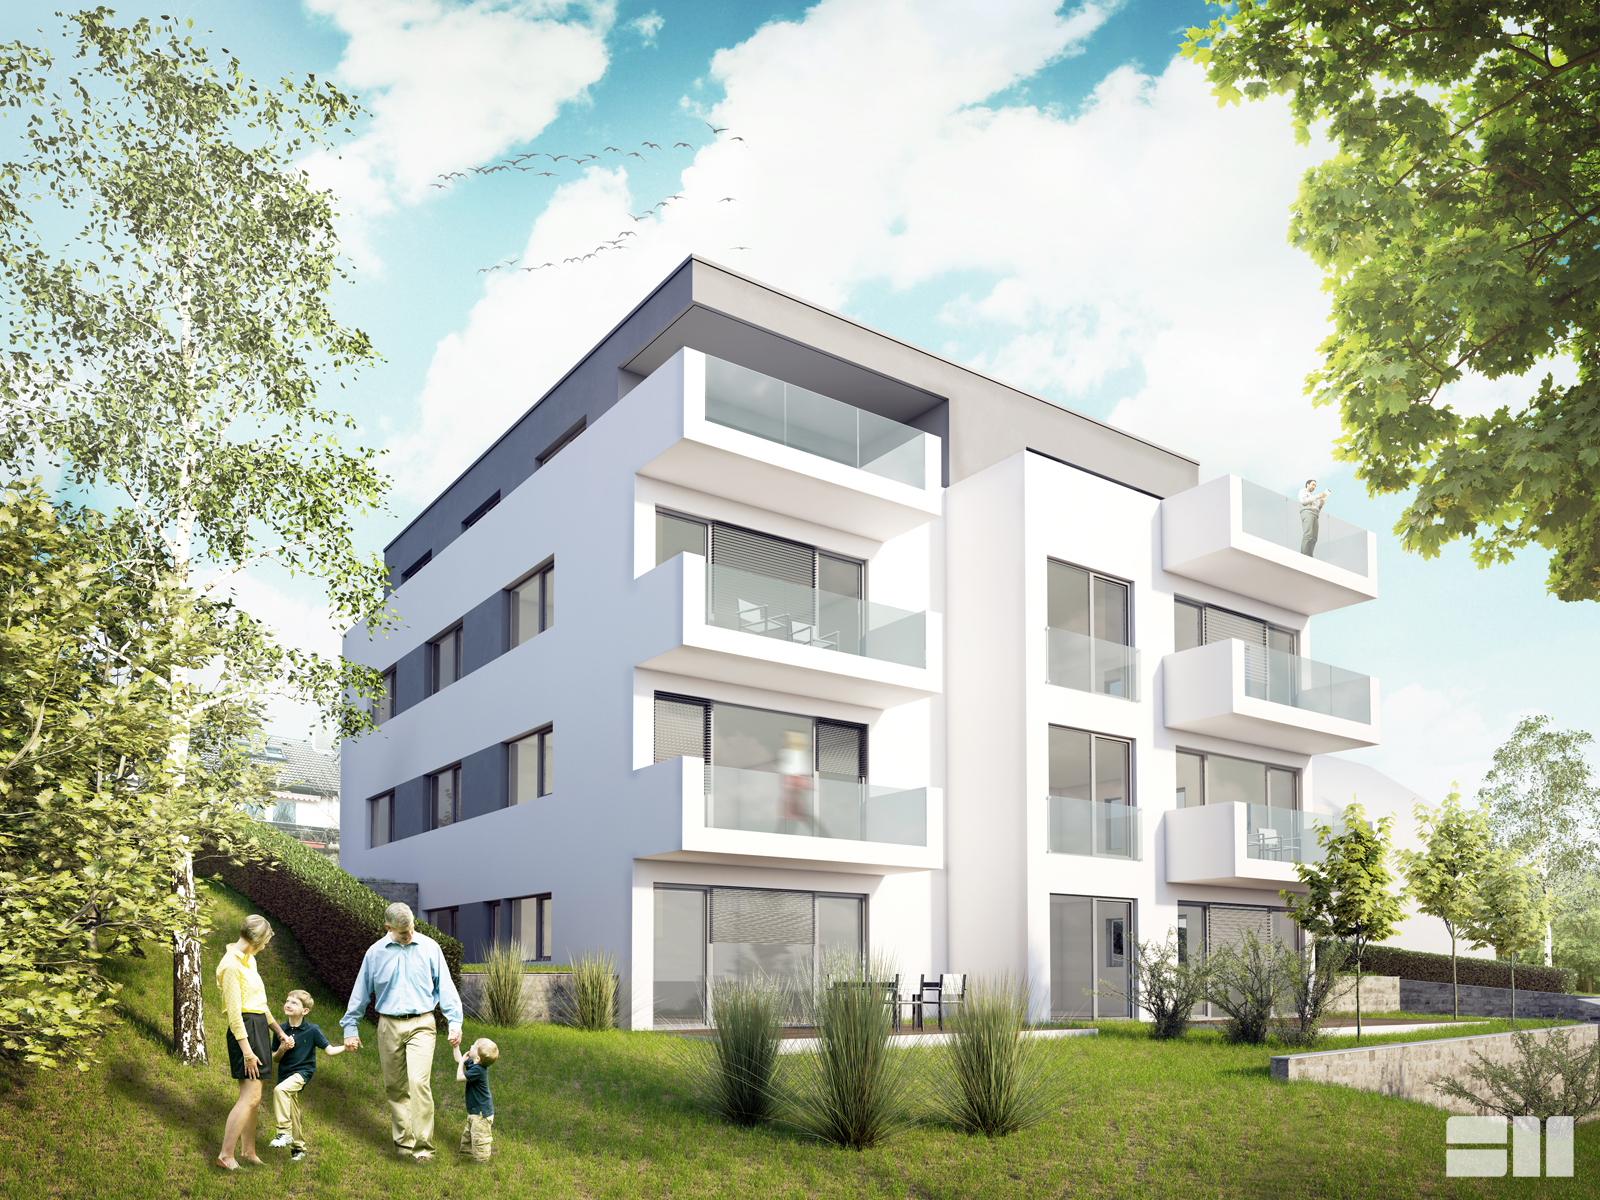 Hirschberg housing project for realisation germany 2015 helwig haus raum planungs gmbh http www helwig architekten de